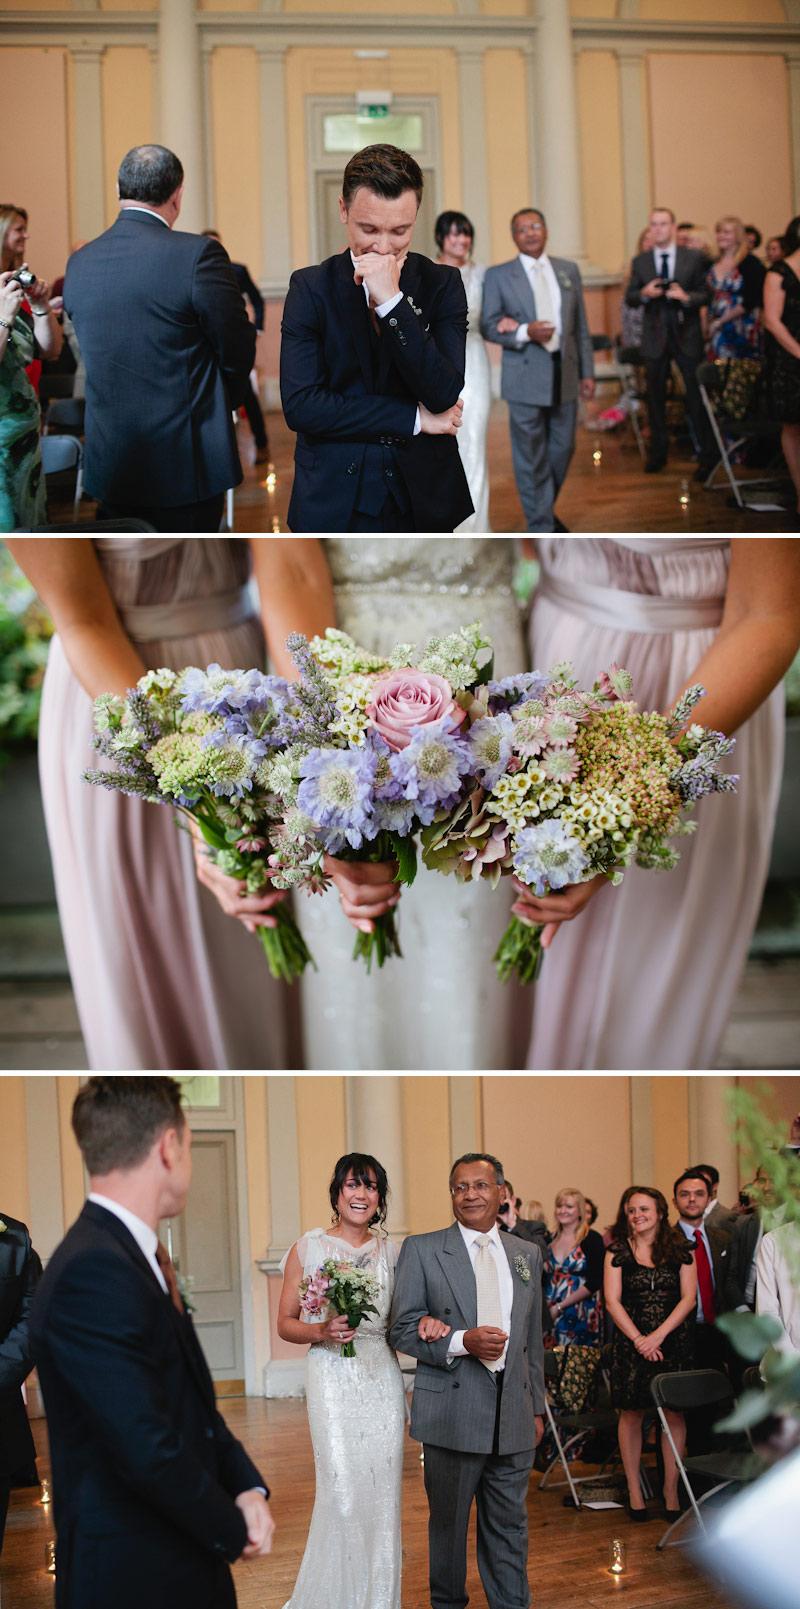 Tarah-Coonan-Bridesmaids-blue-pink-bouquets-